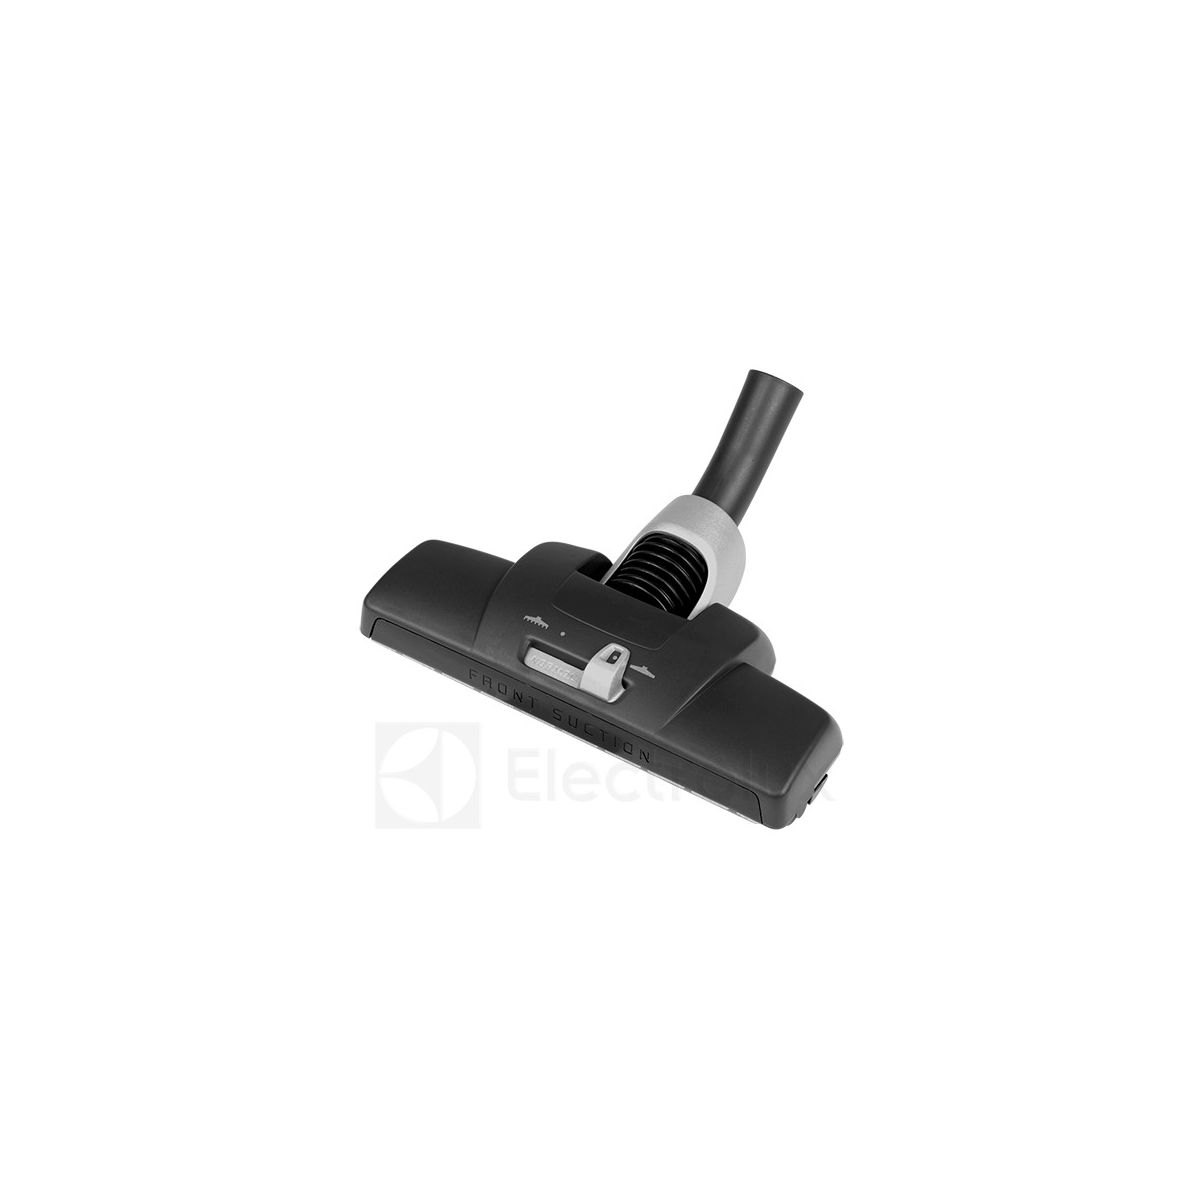 Brosse ELECTROLUX ZE062 1 brosse + adaptateur